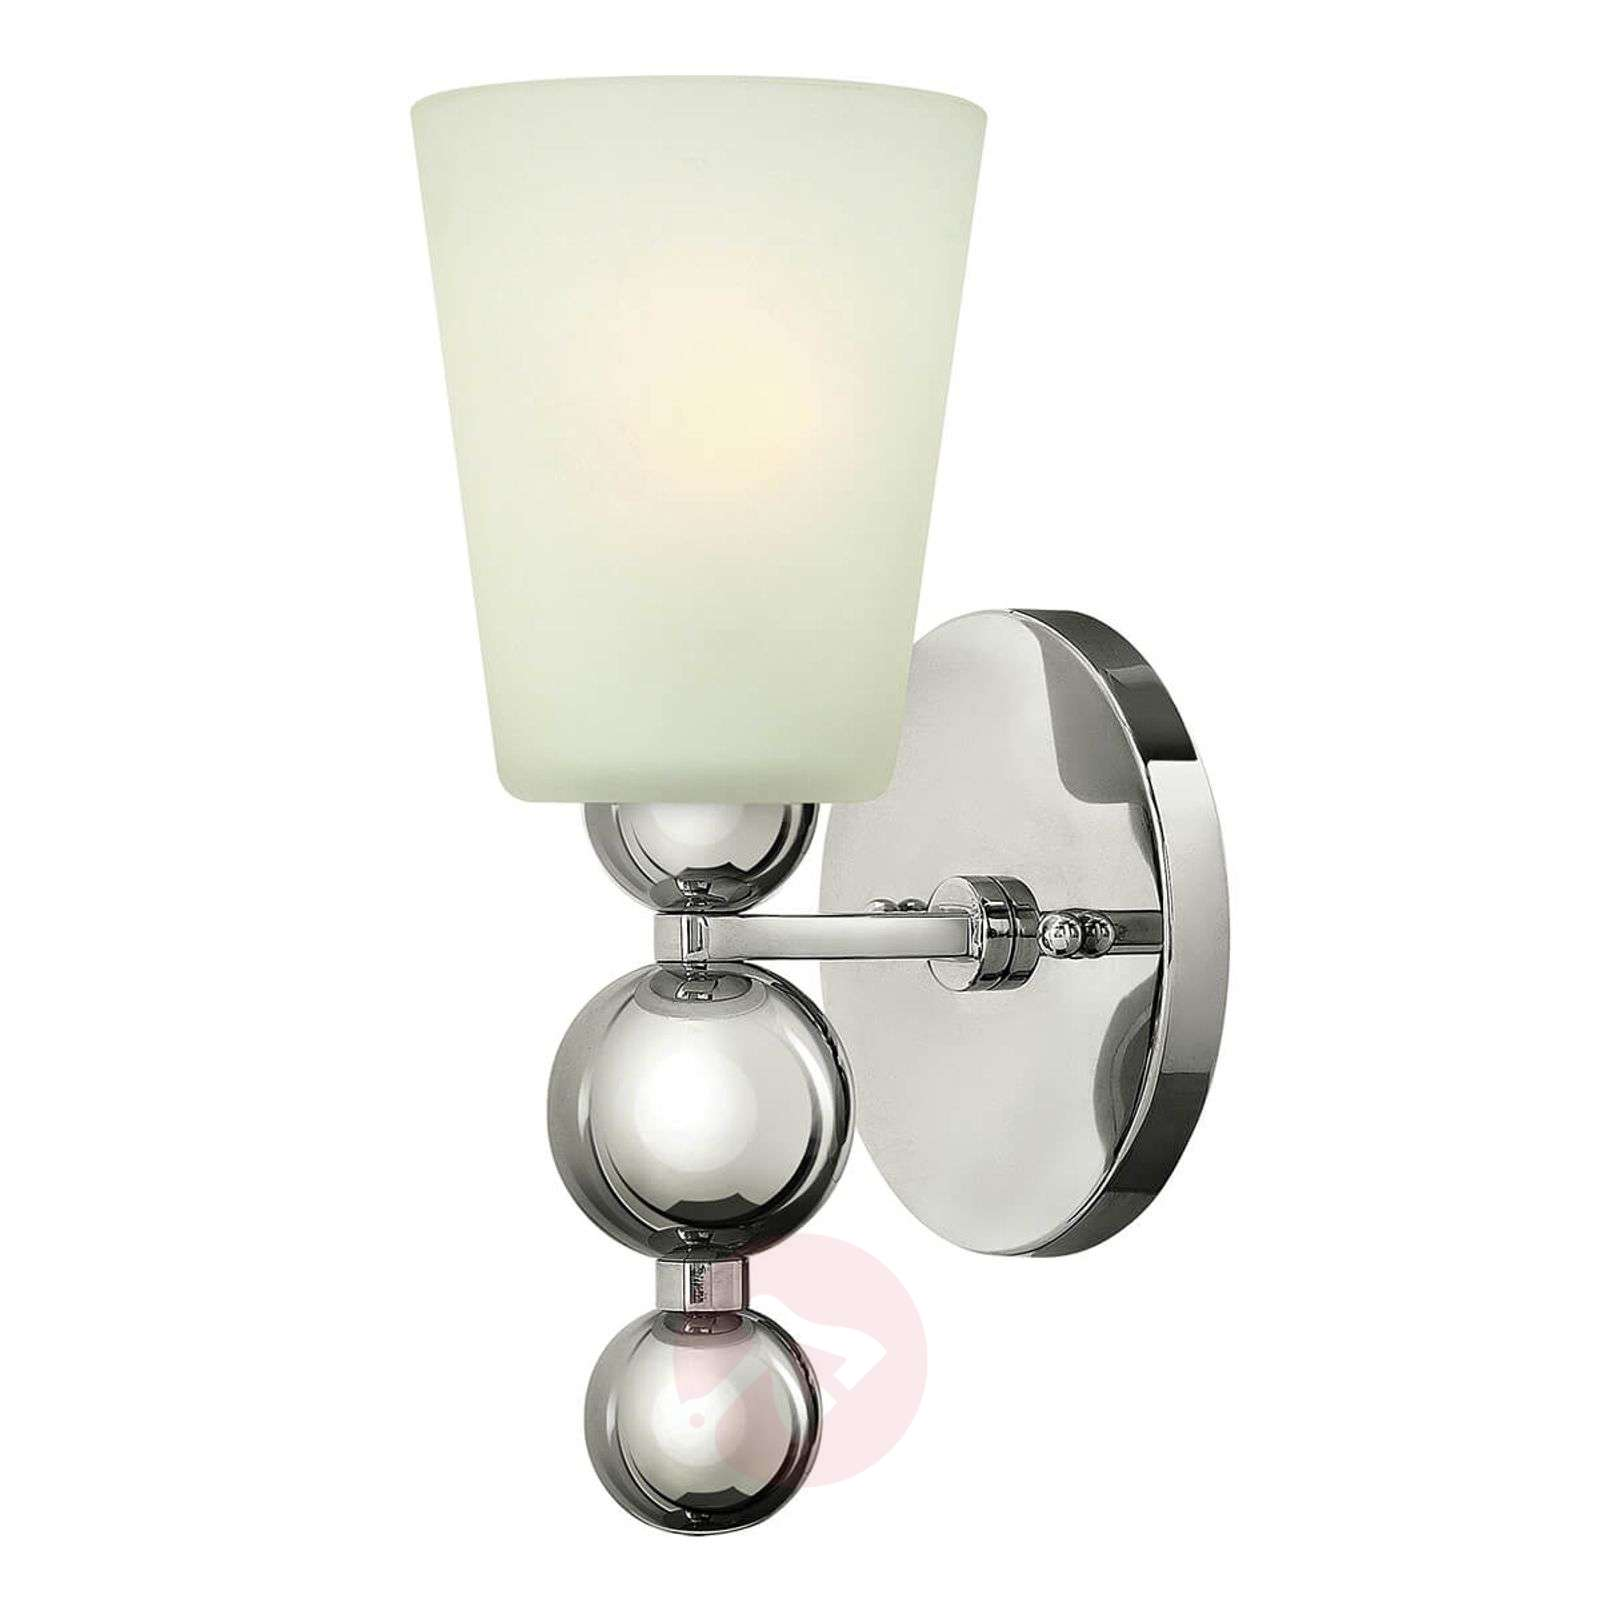 Extravagantly designed wall light Zelda-3048473-01